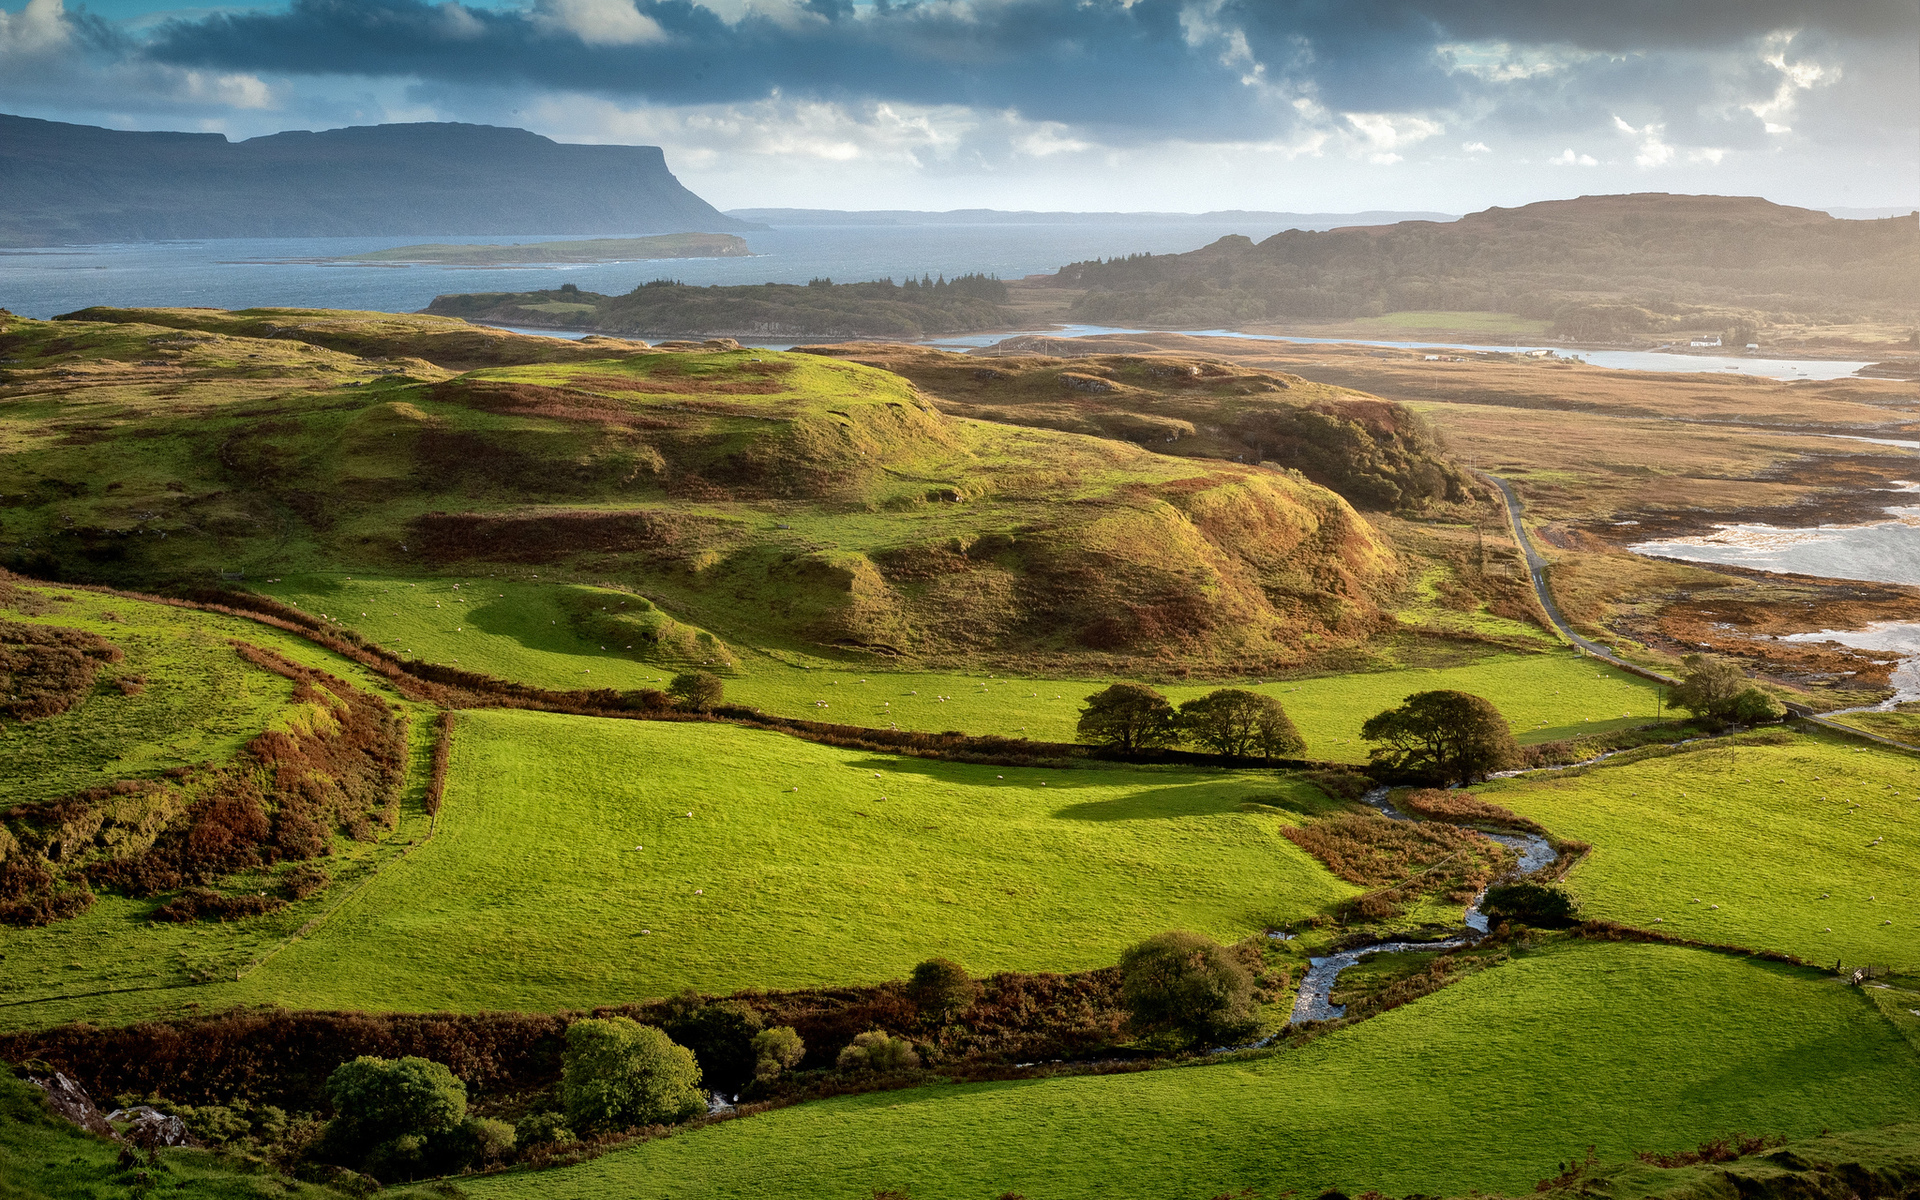 mull-scotland-by-greg-heath-desktop-wallpaper-scotland-landscape-wallpaper-free-desktop-iphone-photos-download-android-5-wallpapers-mac